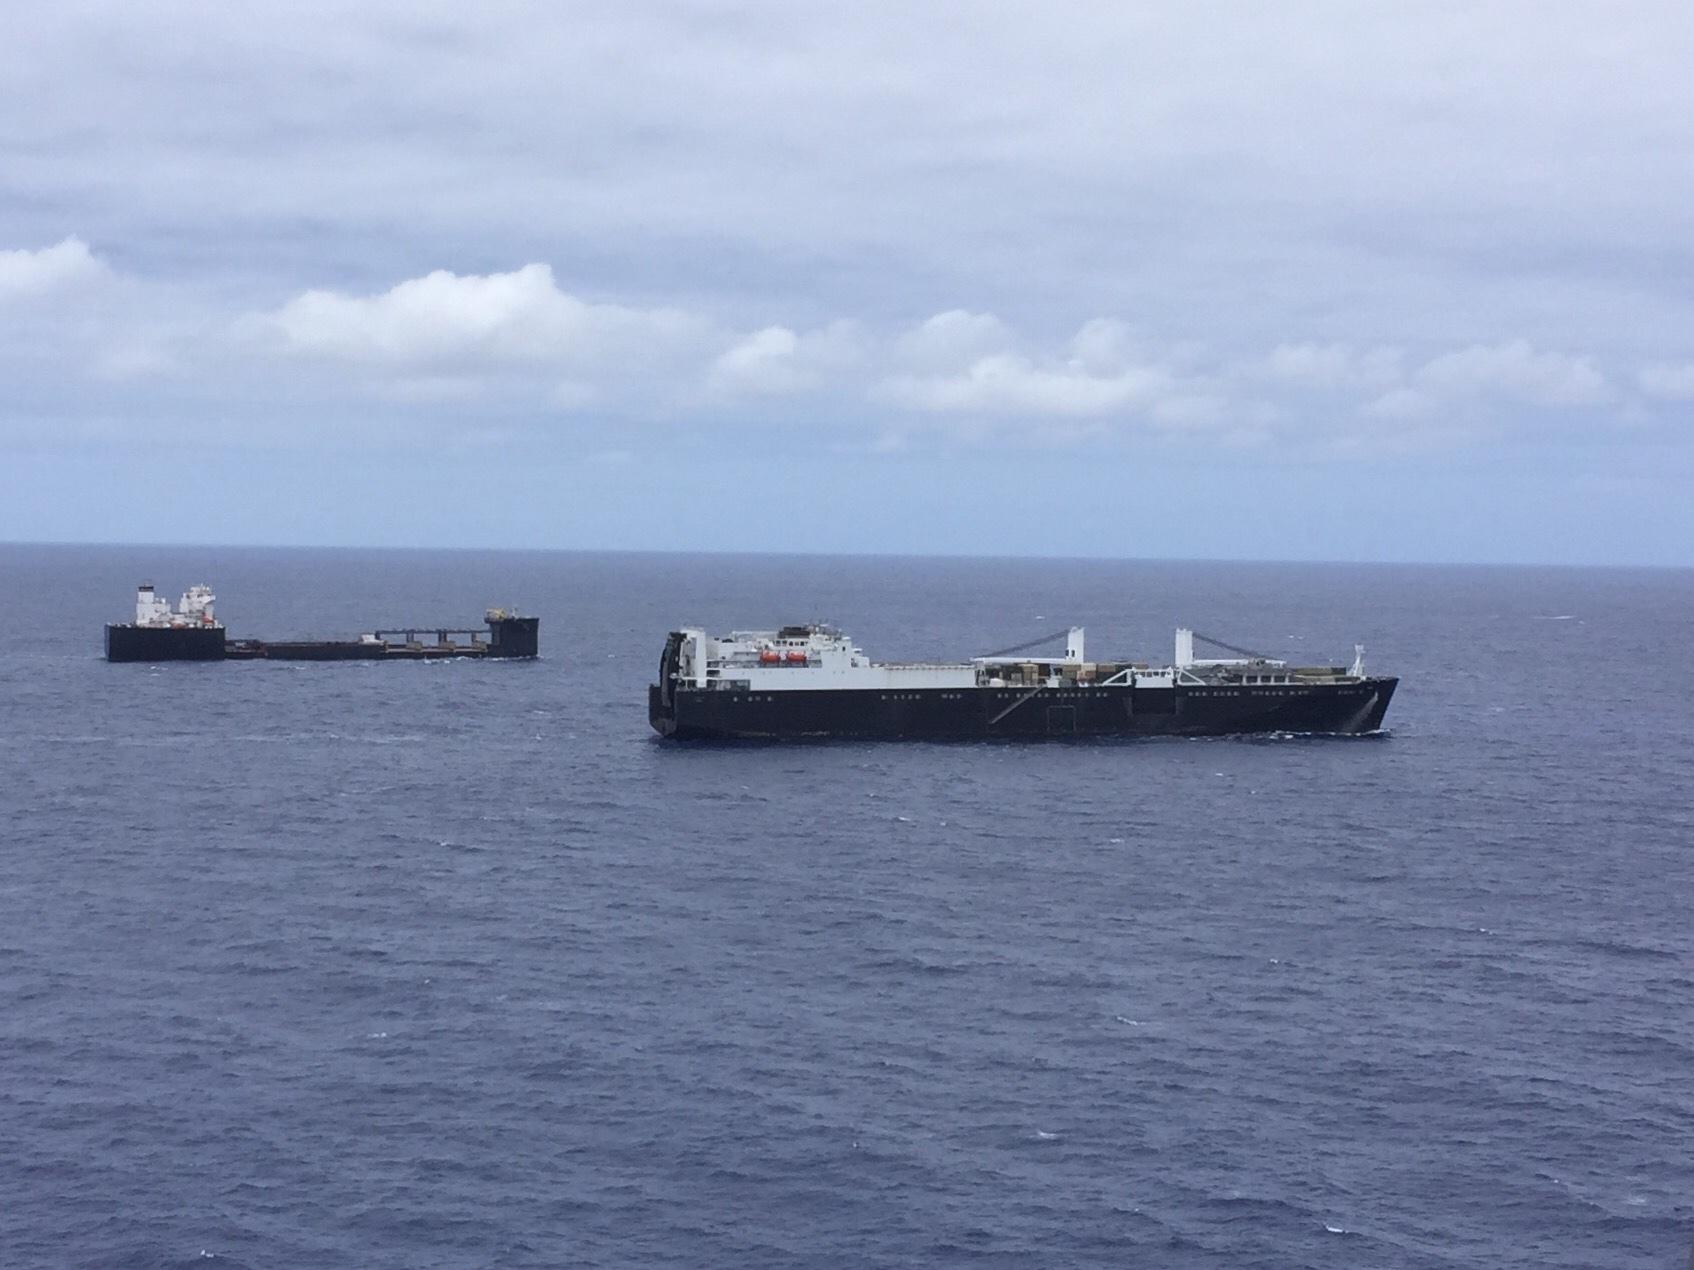 USNS Dahl and USNS Montford Point